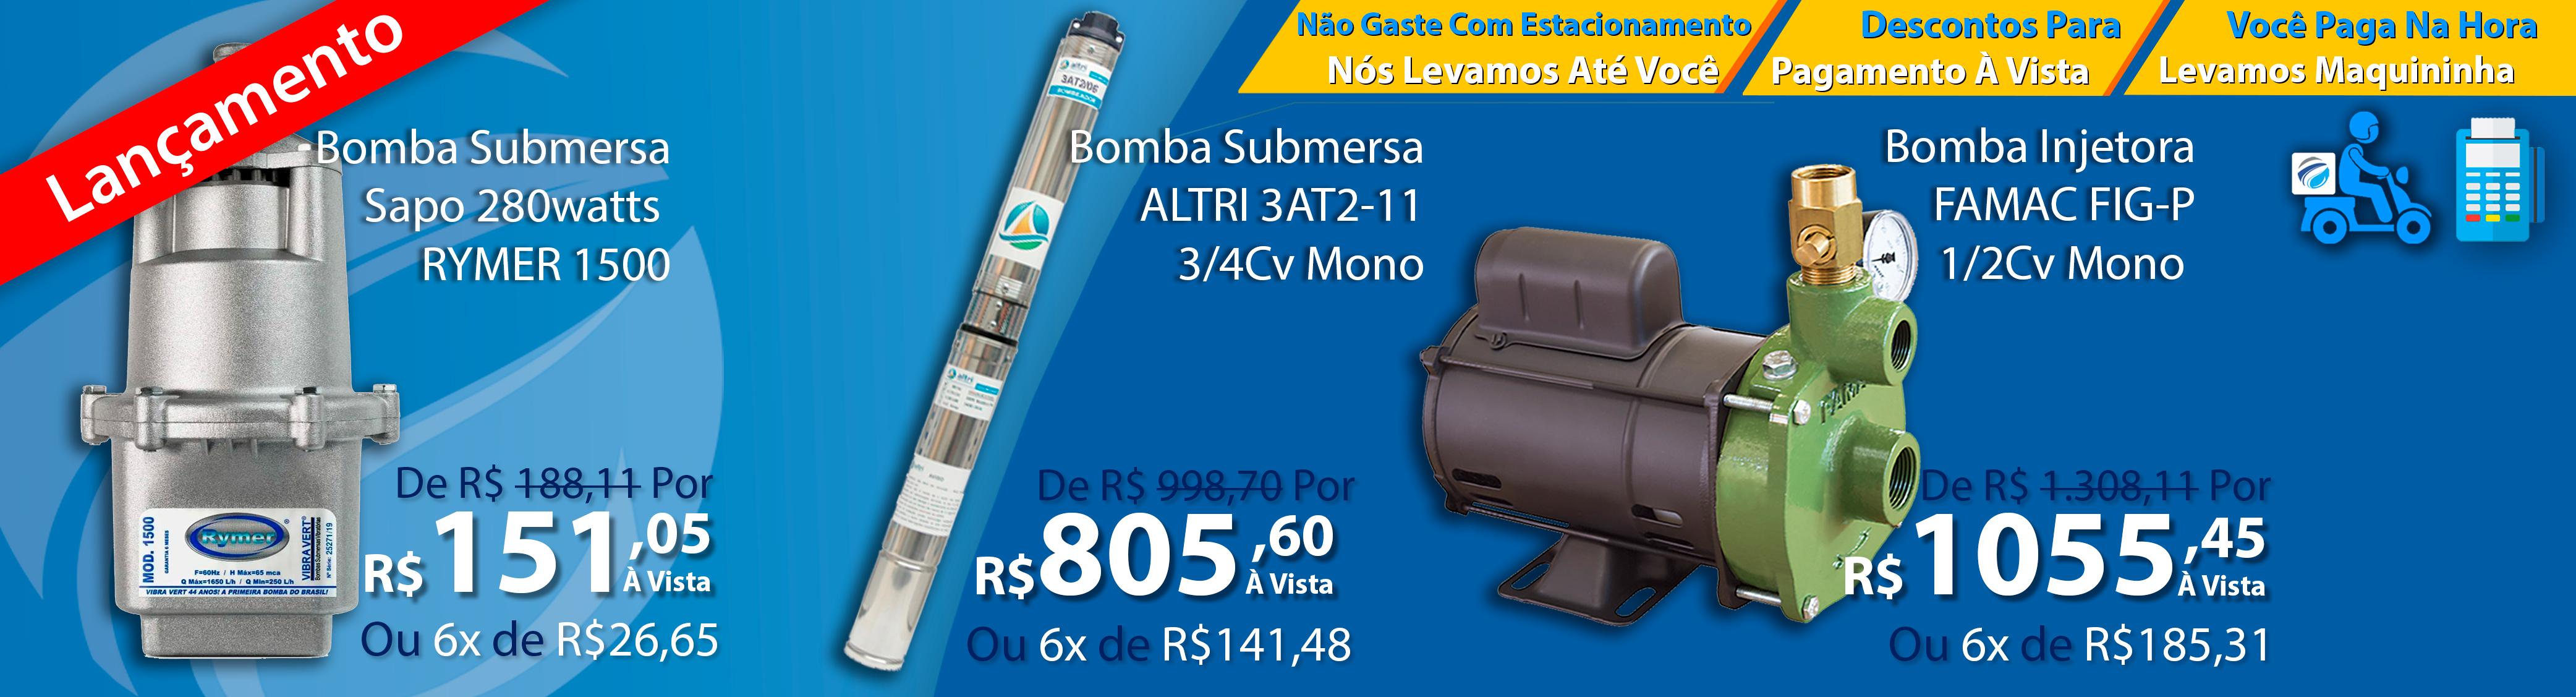 Banner Natal 3 / Sapo / Altri / Inj FAMAC